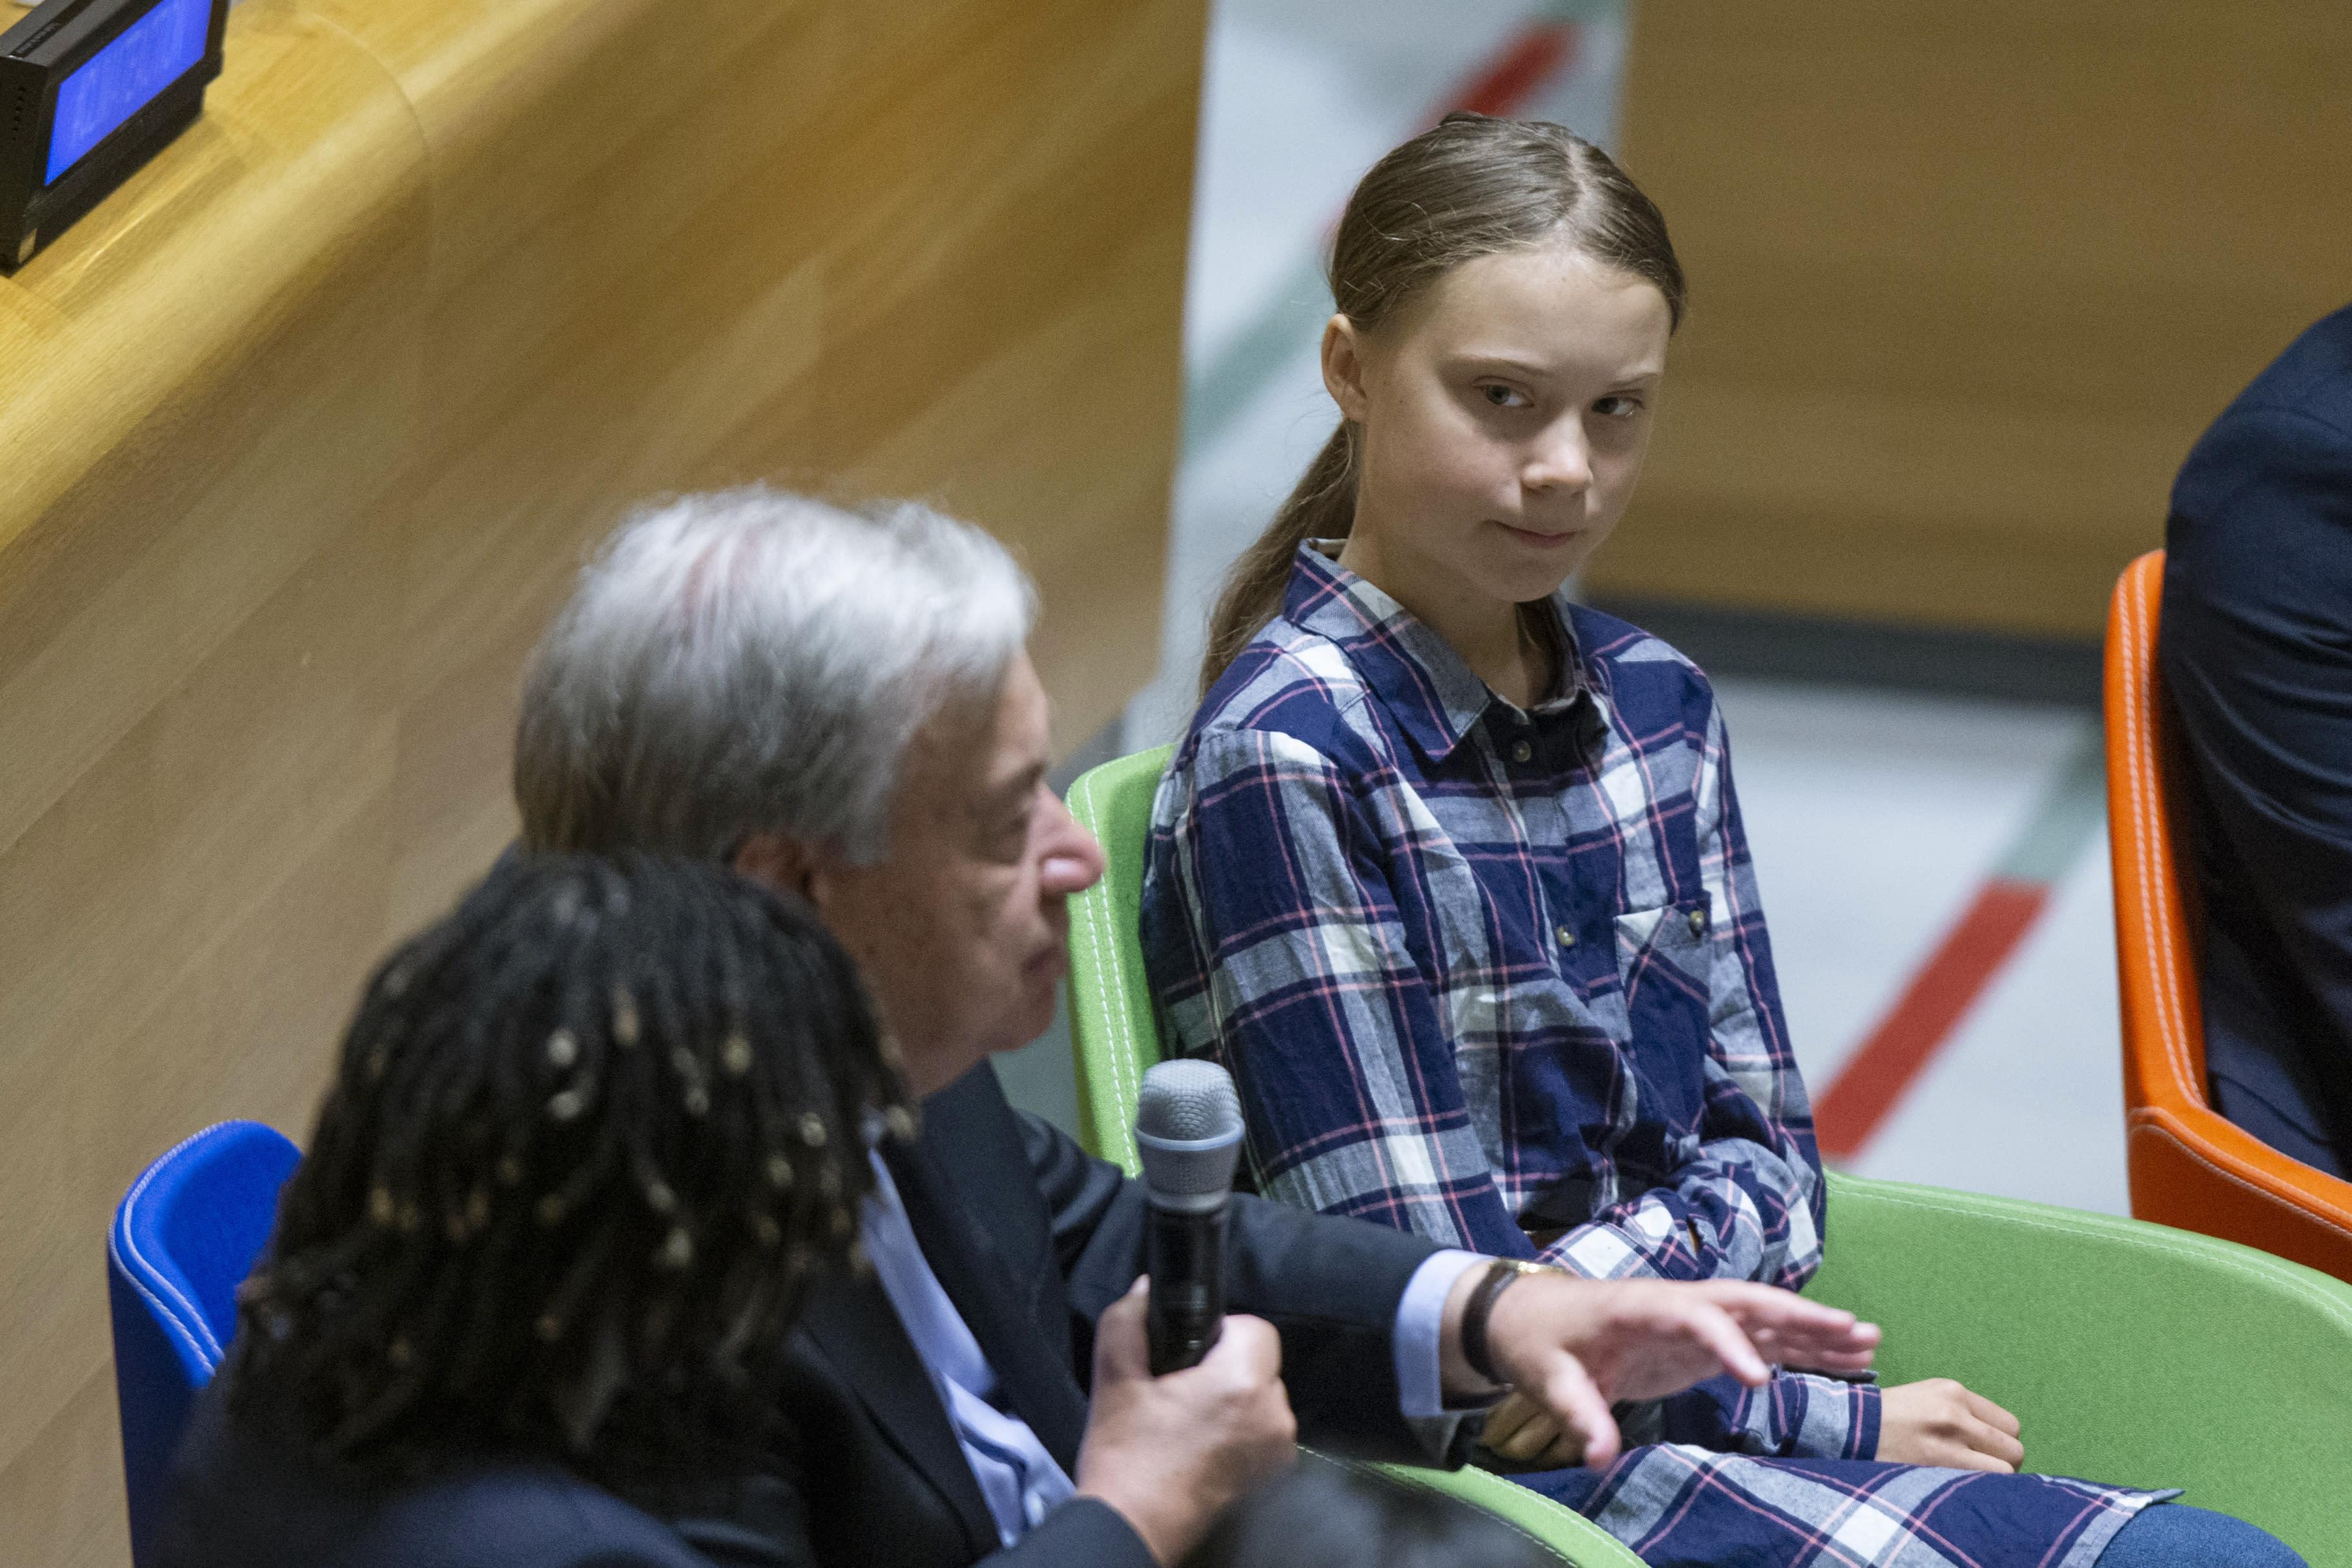 Swedish environmental activist Greta Thunberg, right, listens to U.N. Secretary-General Antonio Guterres, left, during the Youth Climate Summit at United Nations headquarters, Saturday, Sept. 21, 2019. (AP Photo/Eduardo Munoz Alvarez)